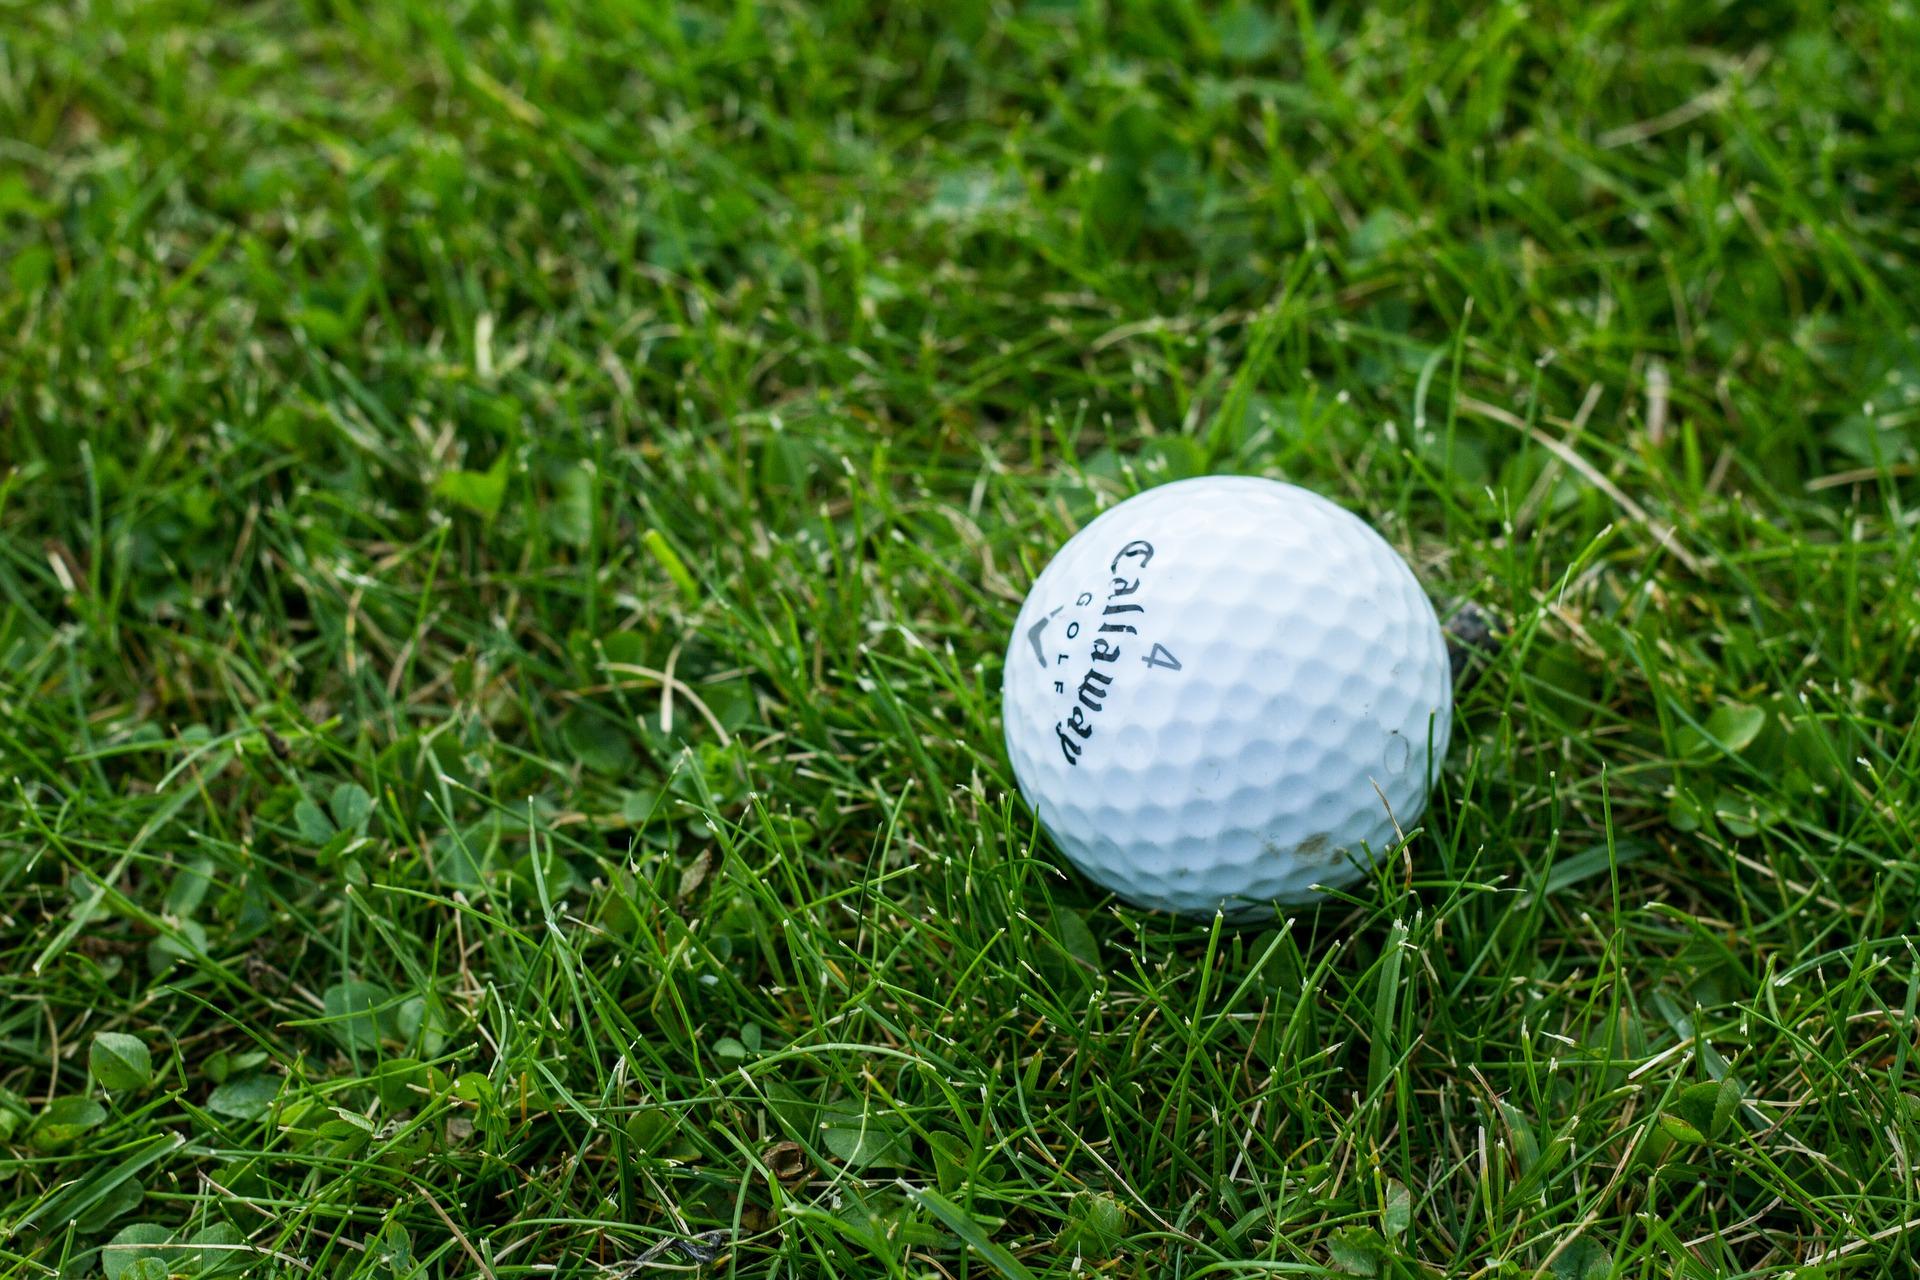 golf ball on green turf ground